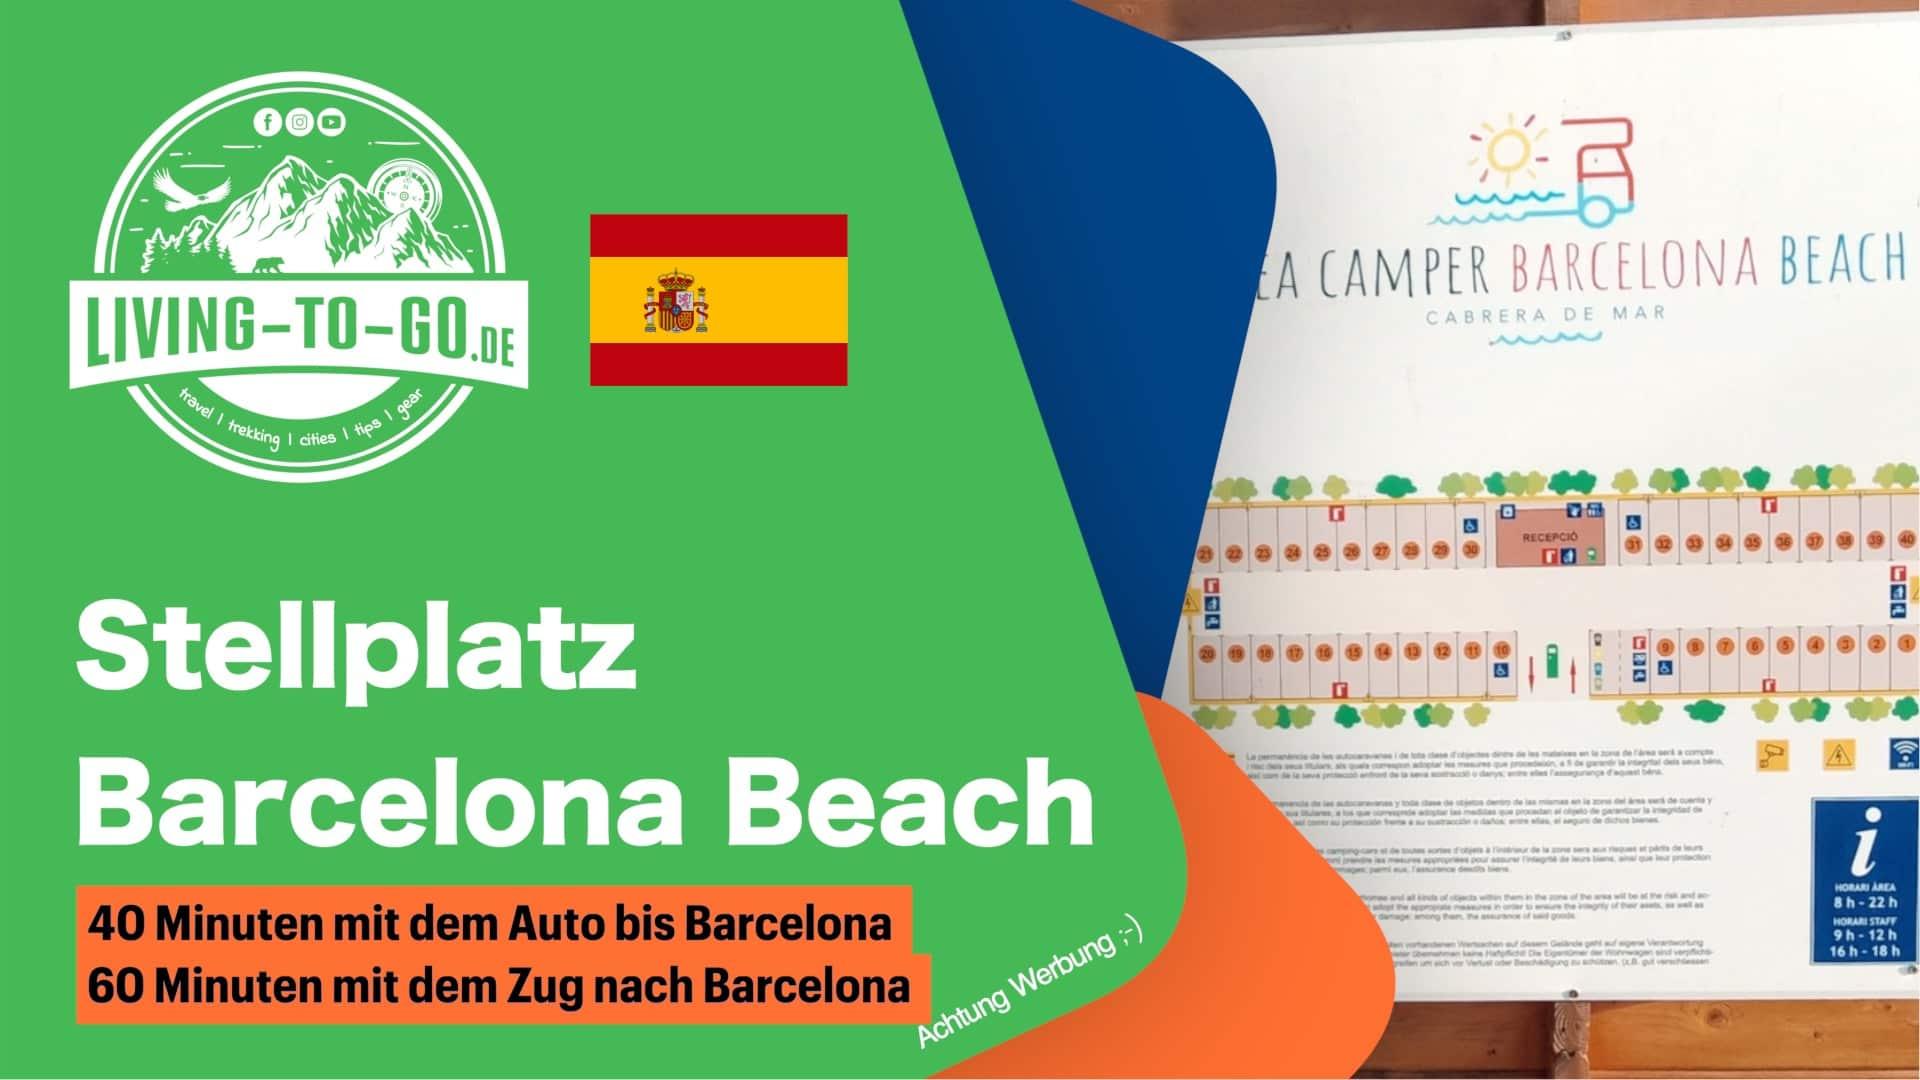 Stellplatz Barcelona Beach